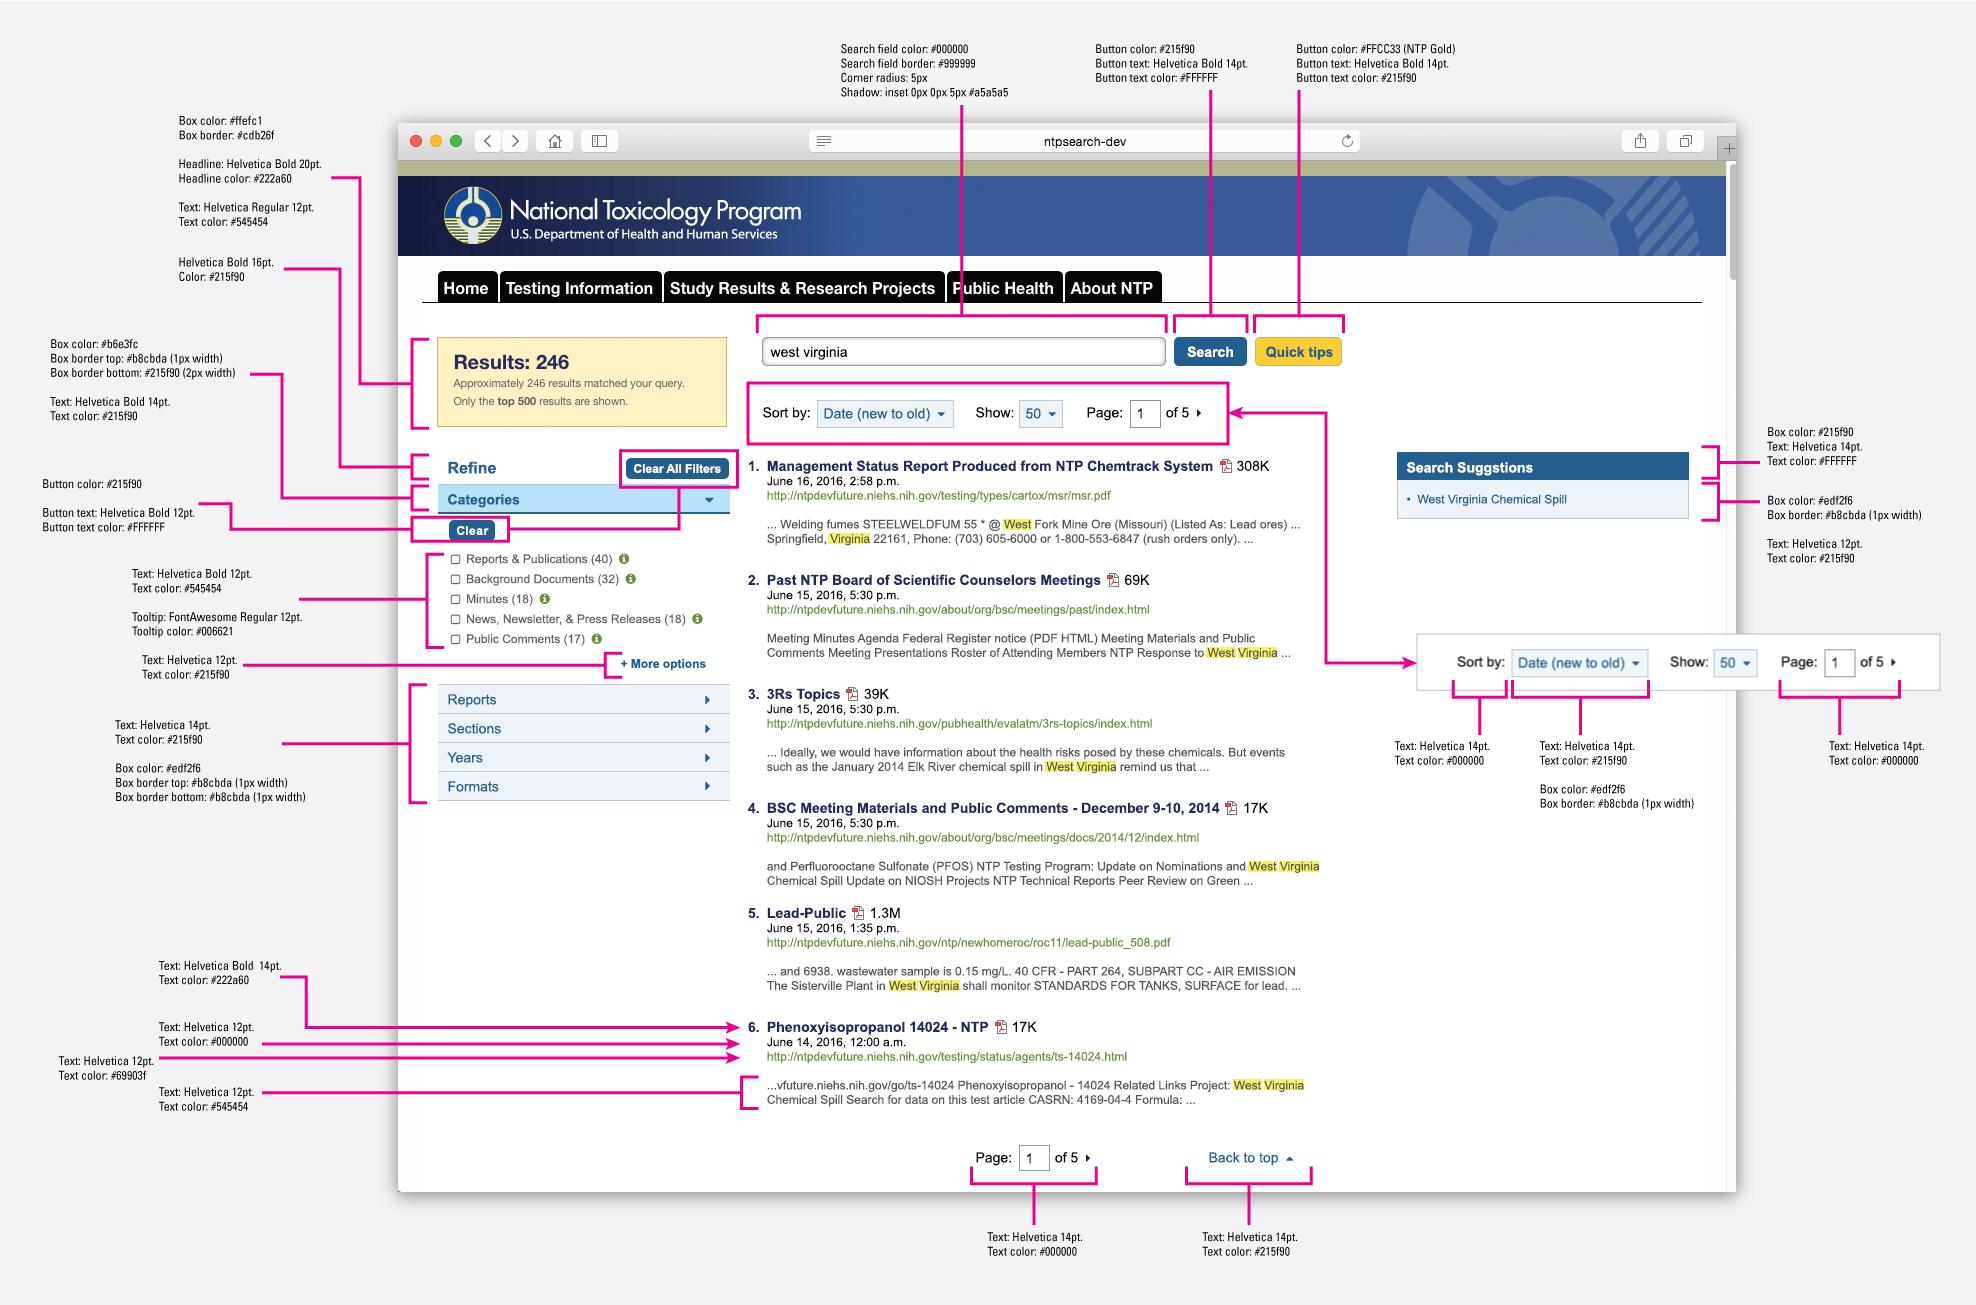 ntp-search_003-styles-titlecase-btn.jpg